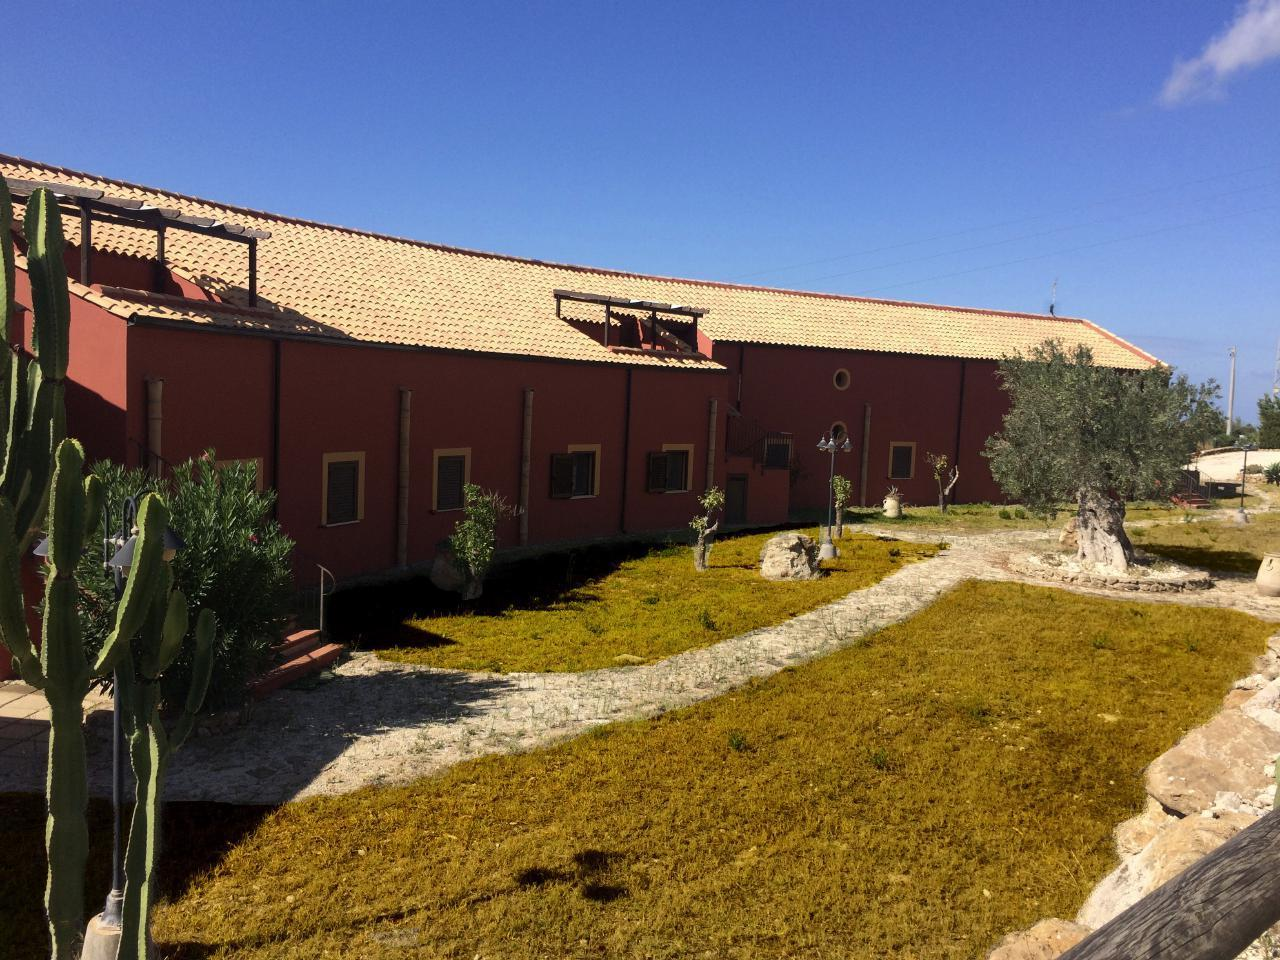 Appartement de vacances Ferienwohnungen (404150), Sciacca, Agrigento, Sicile, Italie, image 10